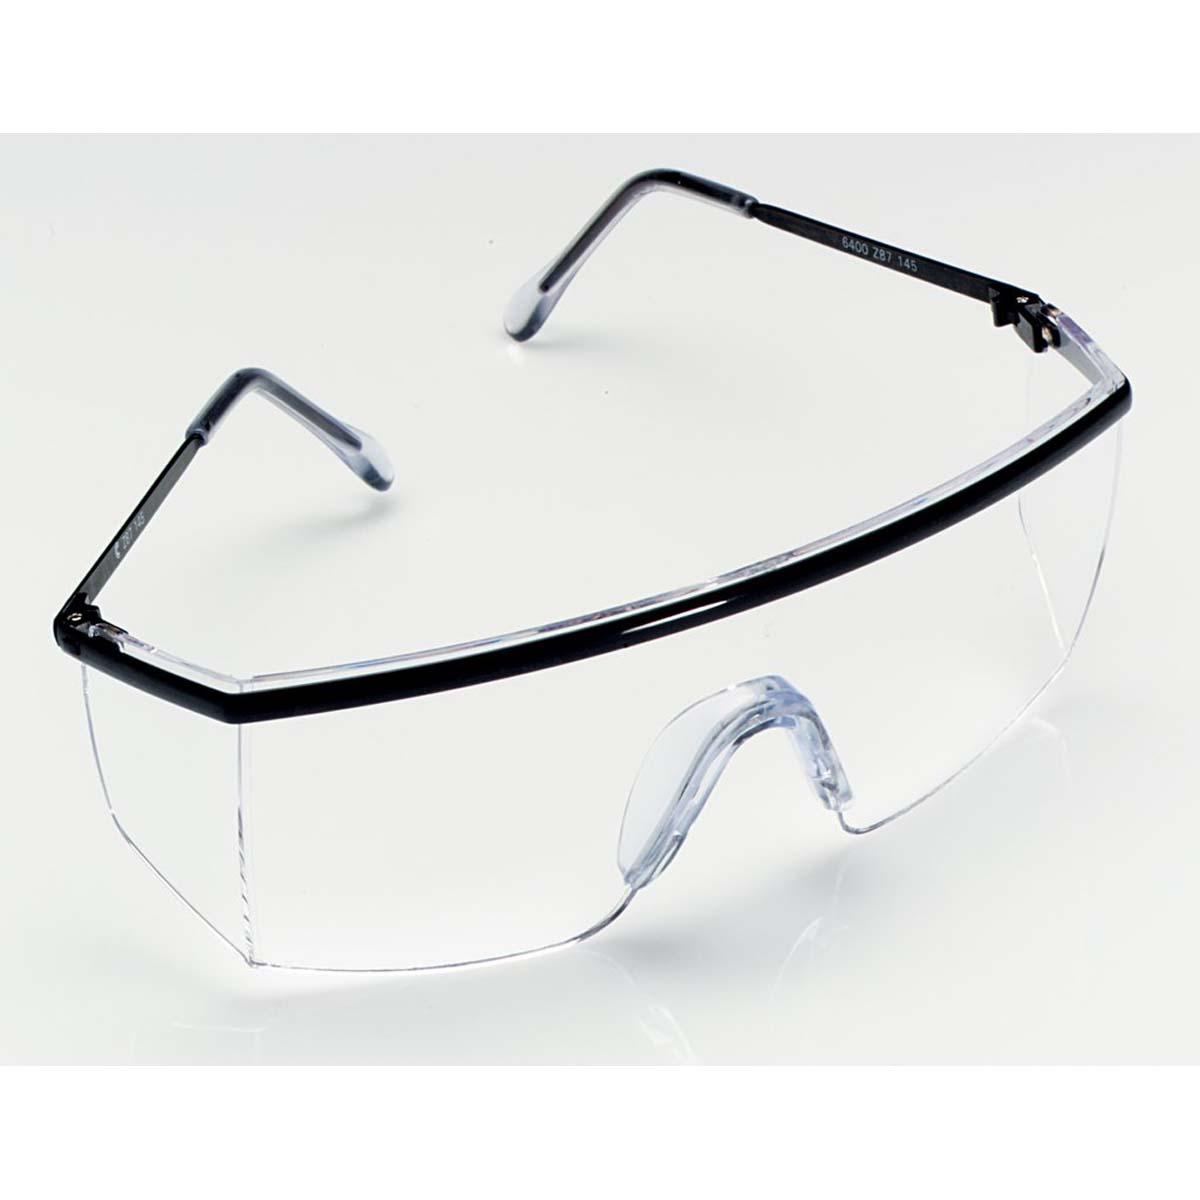 "3Mâ""¢ Nassau Plusâ""¢ Protective Eyewear 14300-00000-20 Black Frame, Clear Lens,"